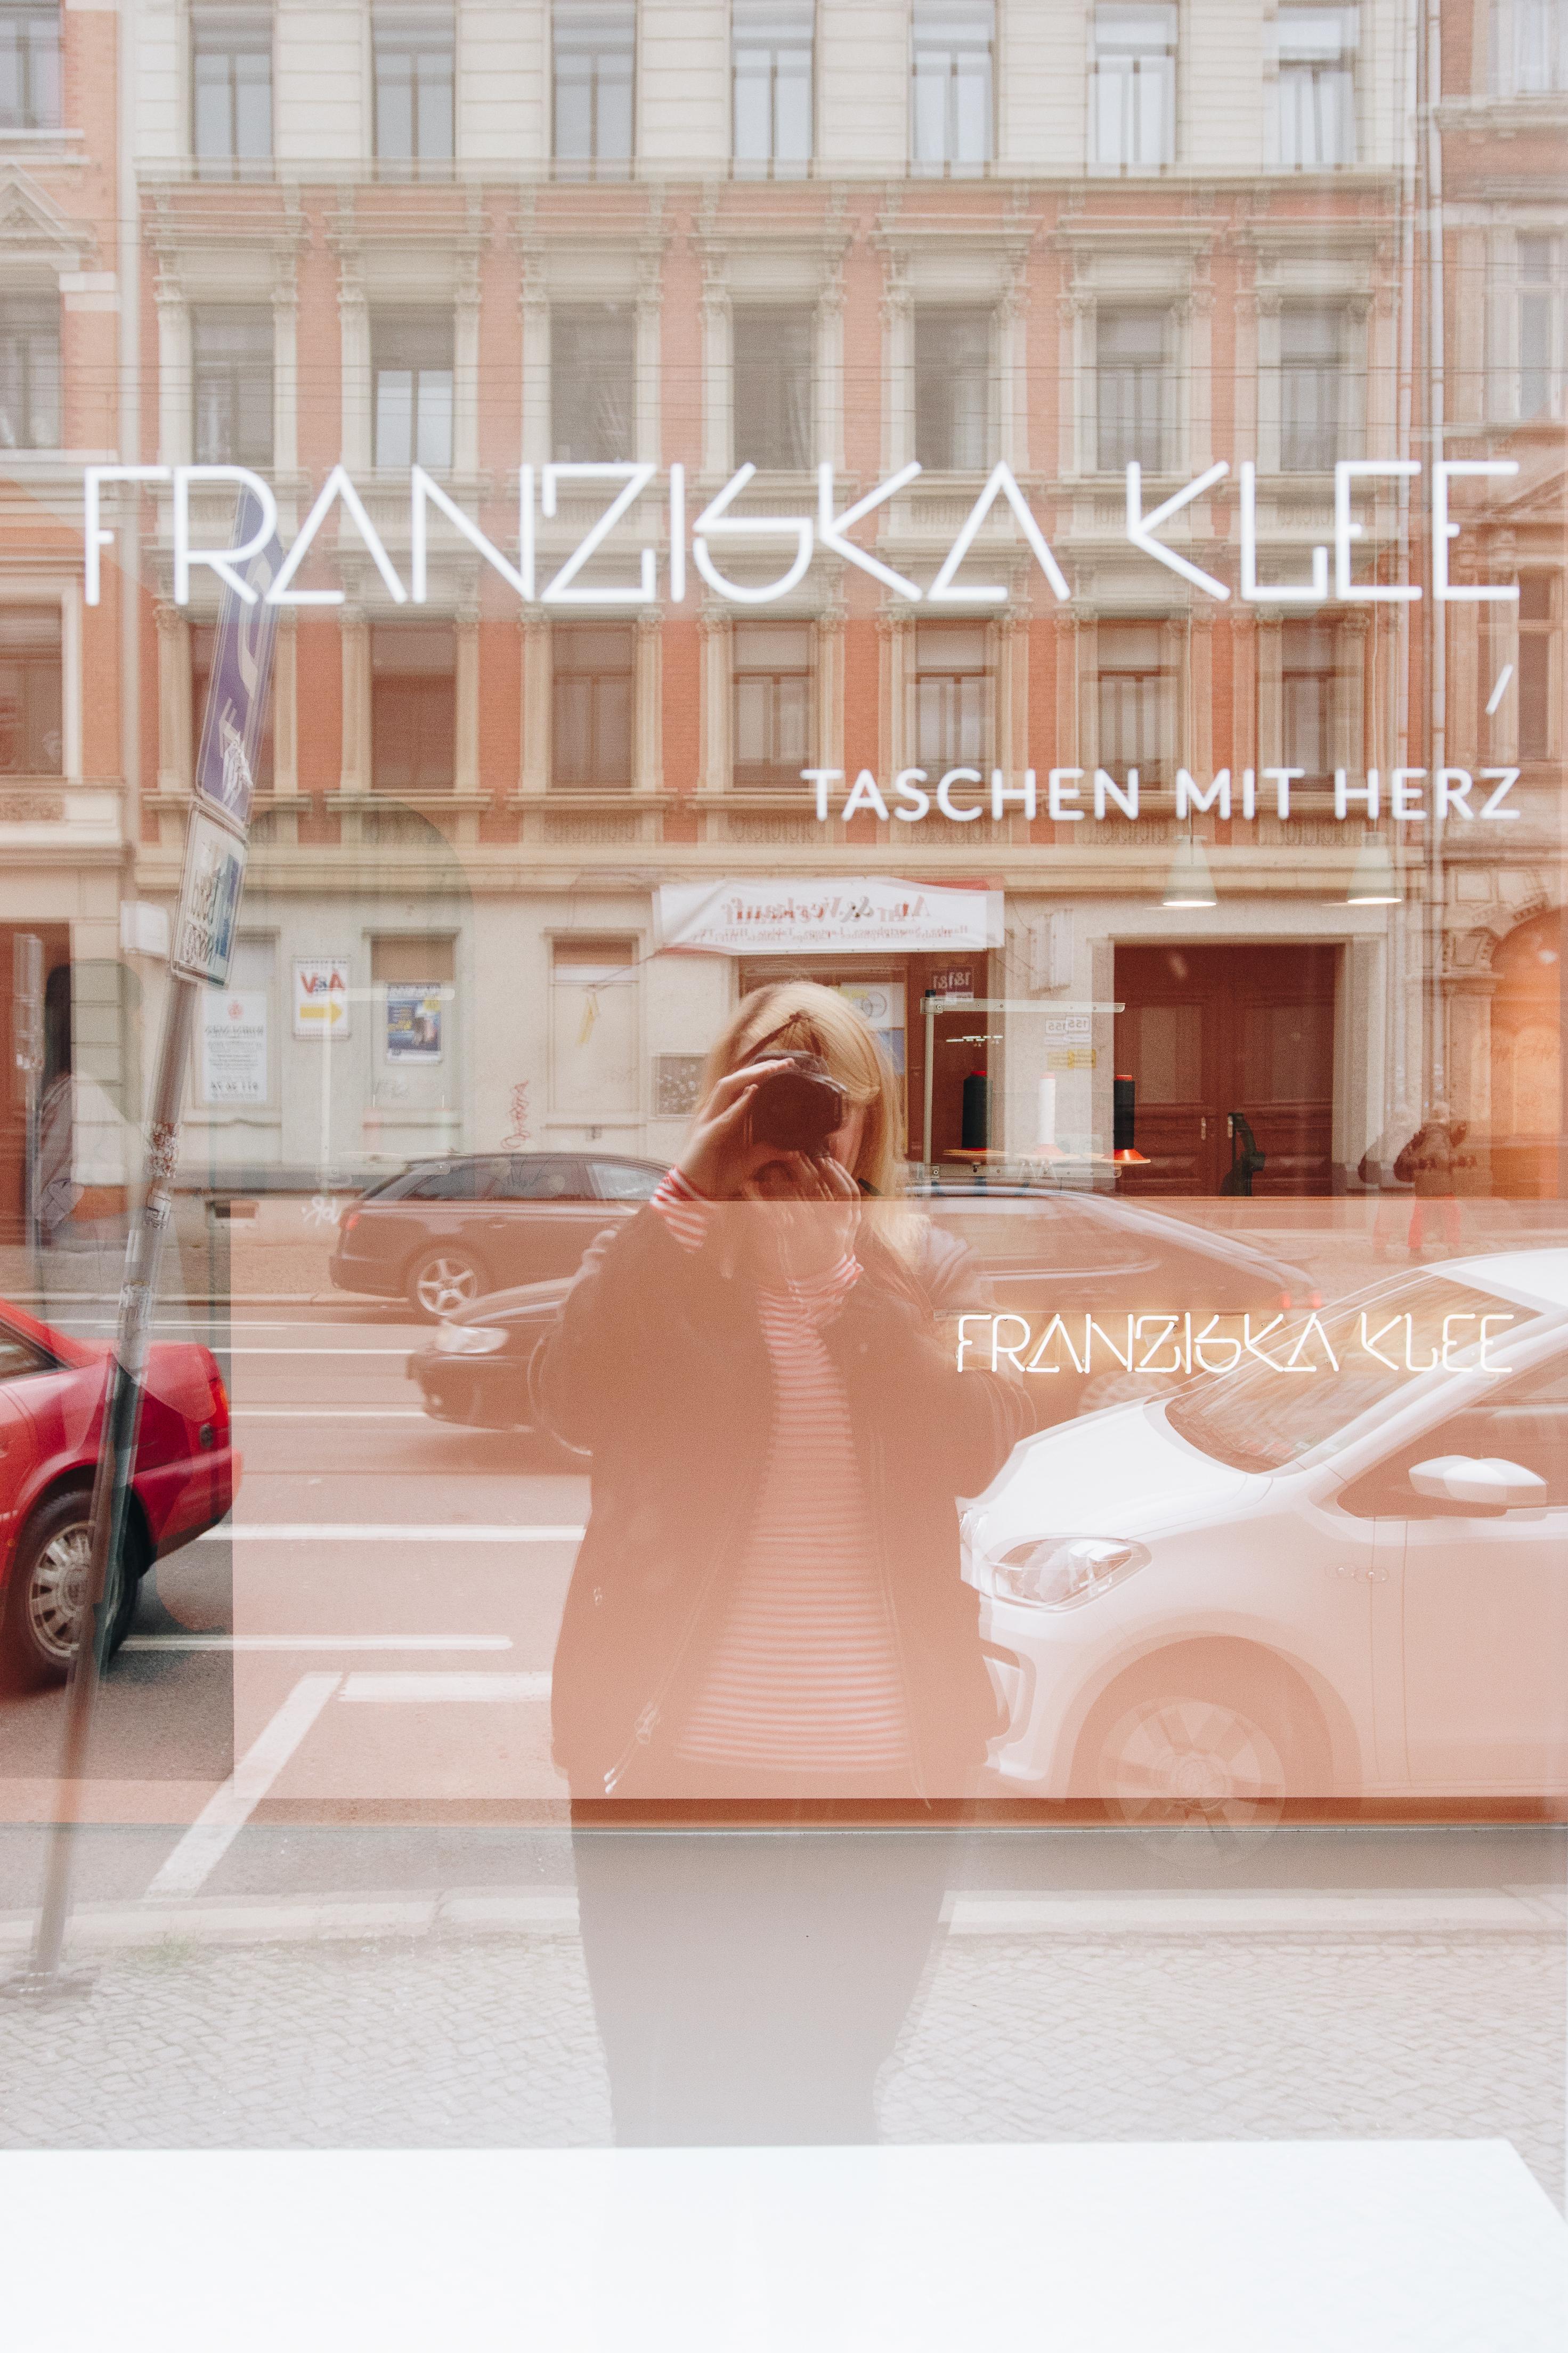 franziska klee-leipzig-annabelle sagt-design-label49